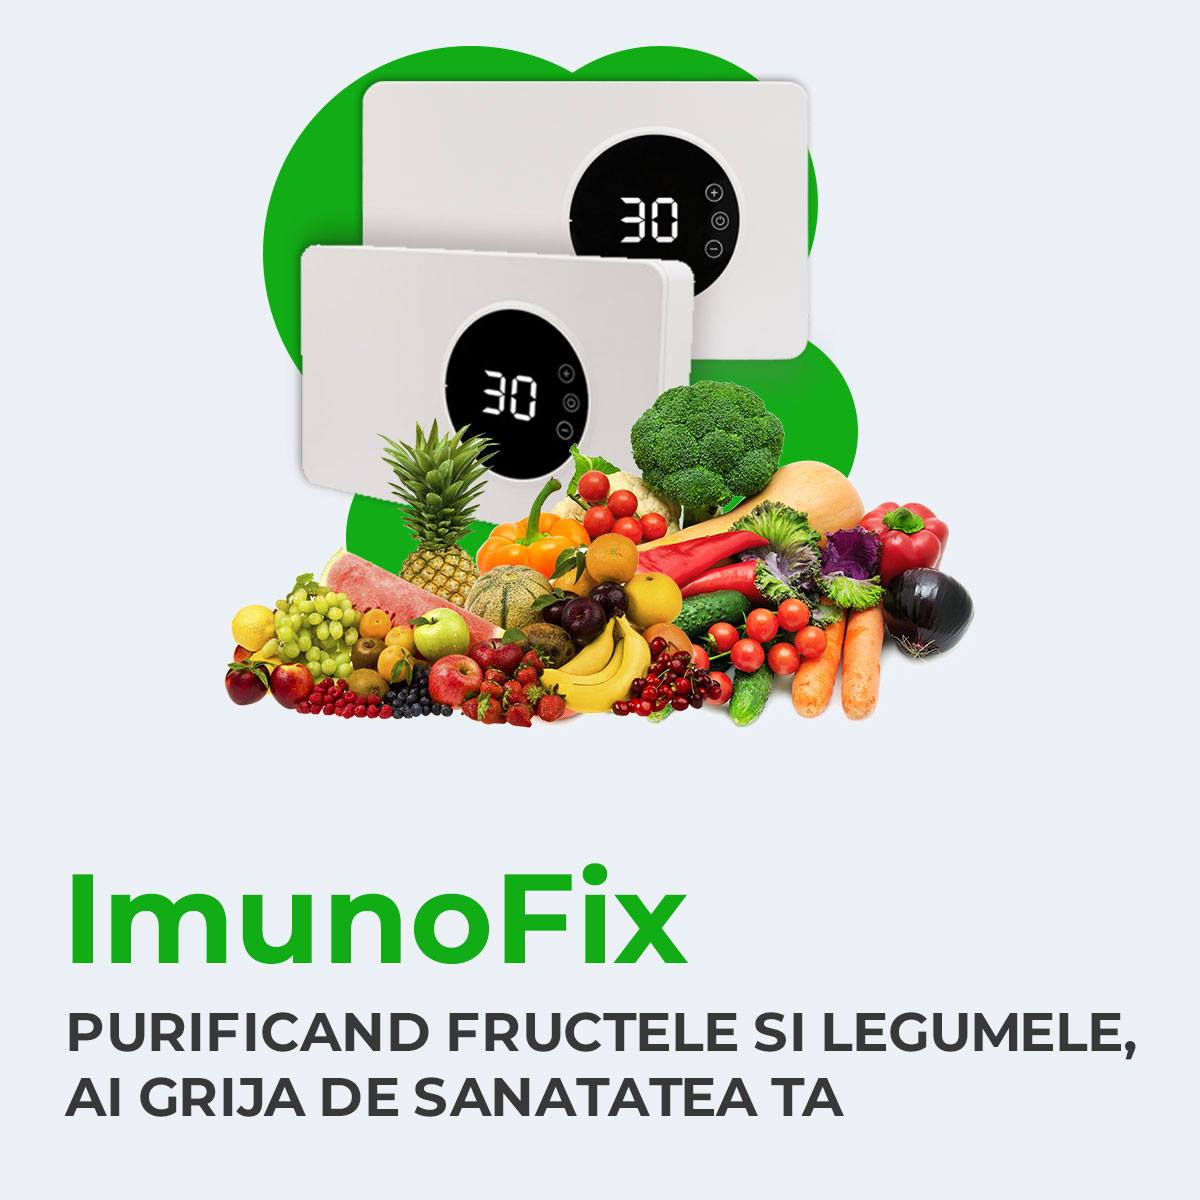 Exerciții eficiente pentru vene varicoase, Fresh articles